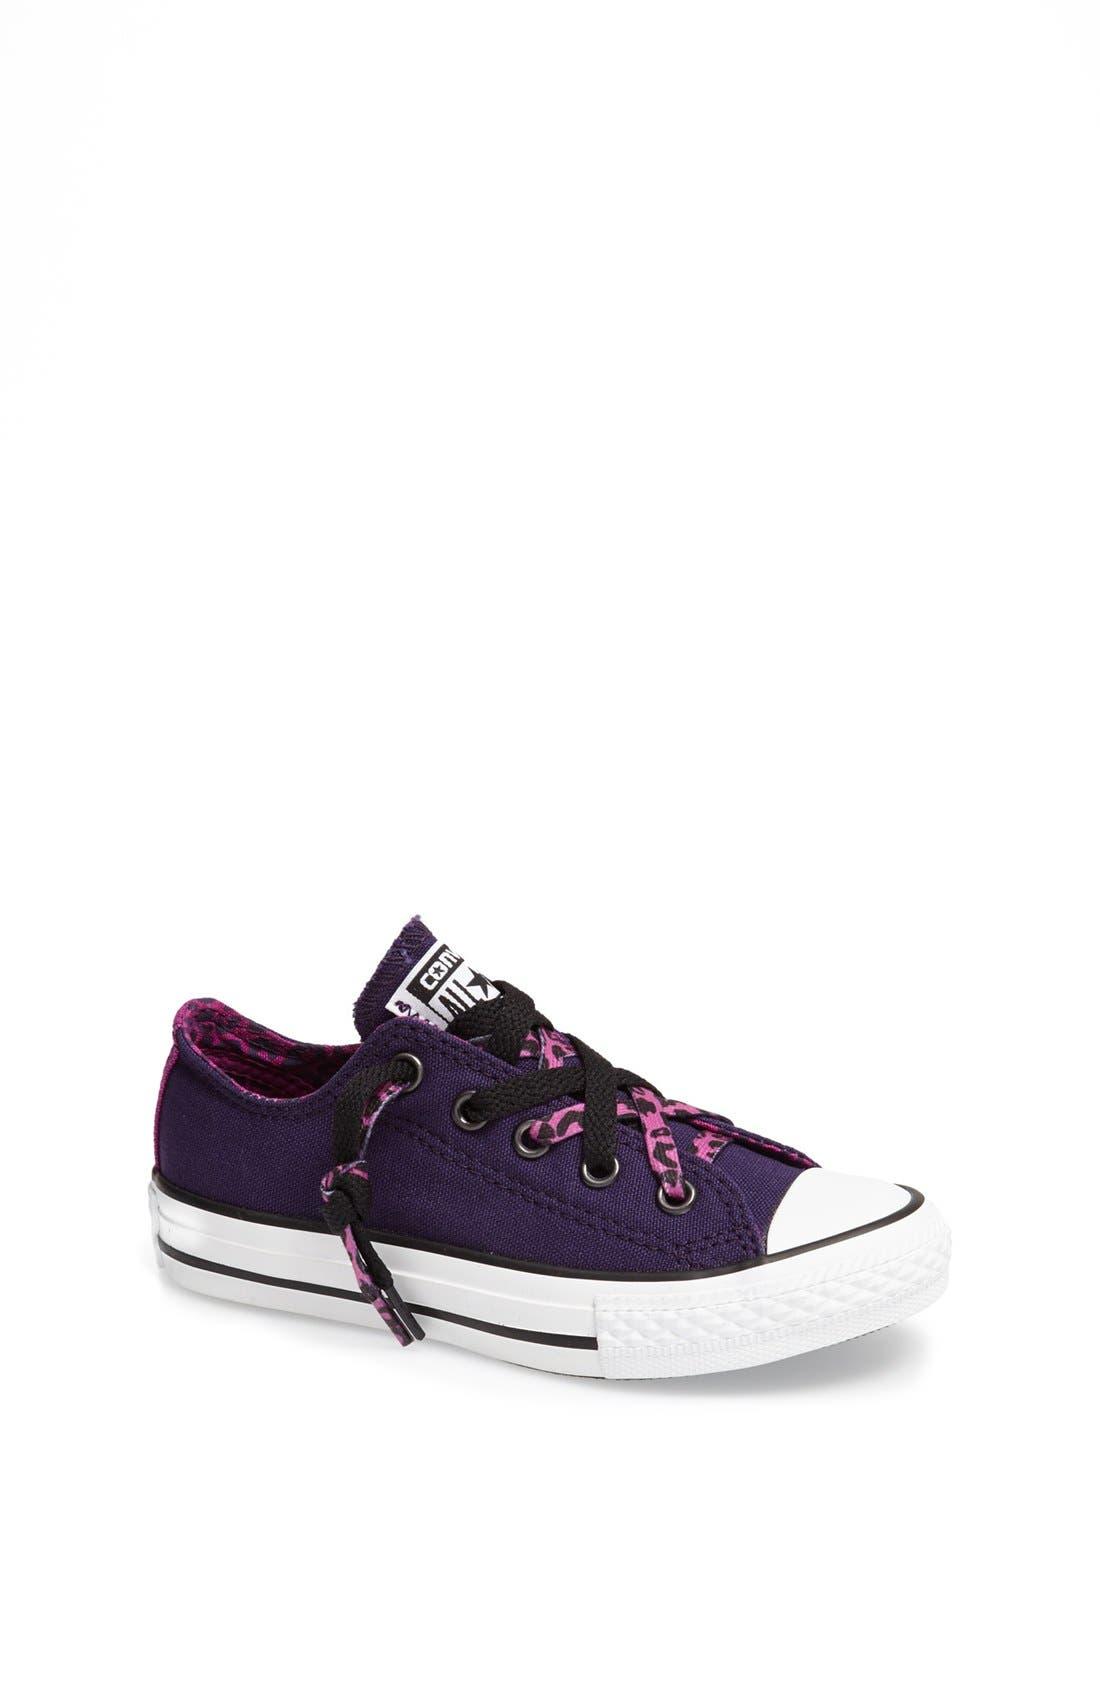 Main Image - Converse Chuck Taylor® All Star® 'Kriss N Kross' Sneaker (Toddler, Little Kid & Big Kid)